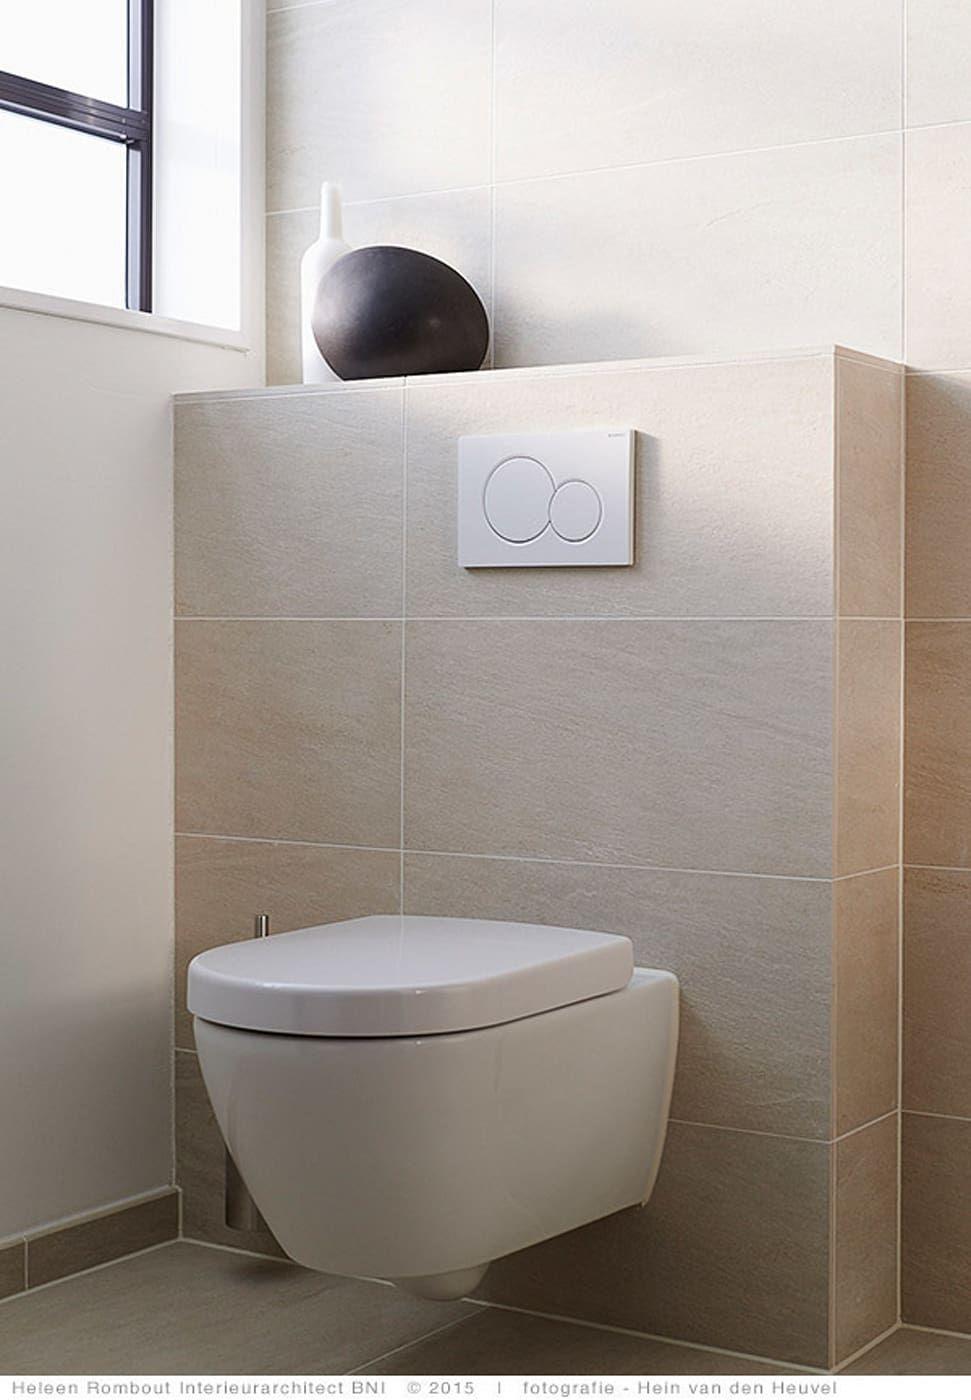 Badezimmer von heleen rombout interieurarchitect bni, modern #amenagementmaison